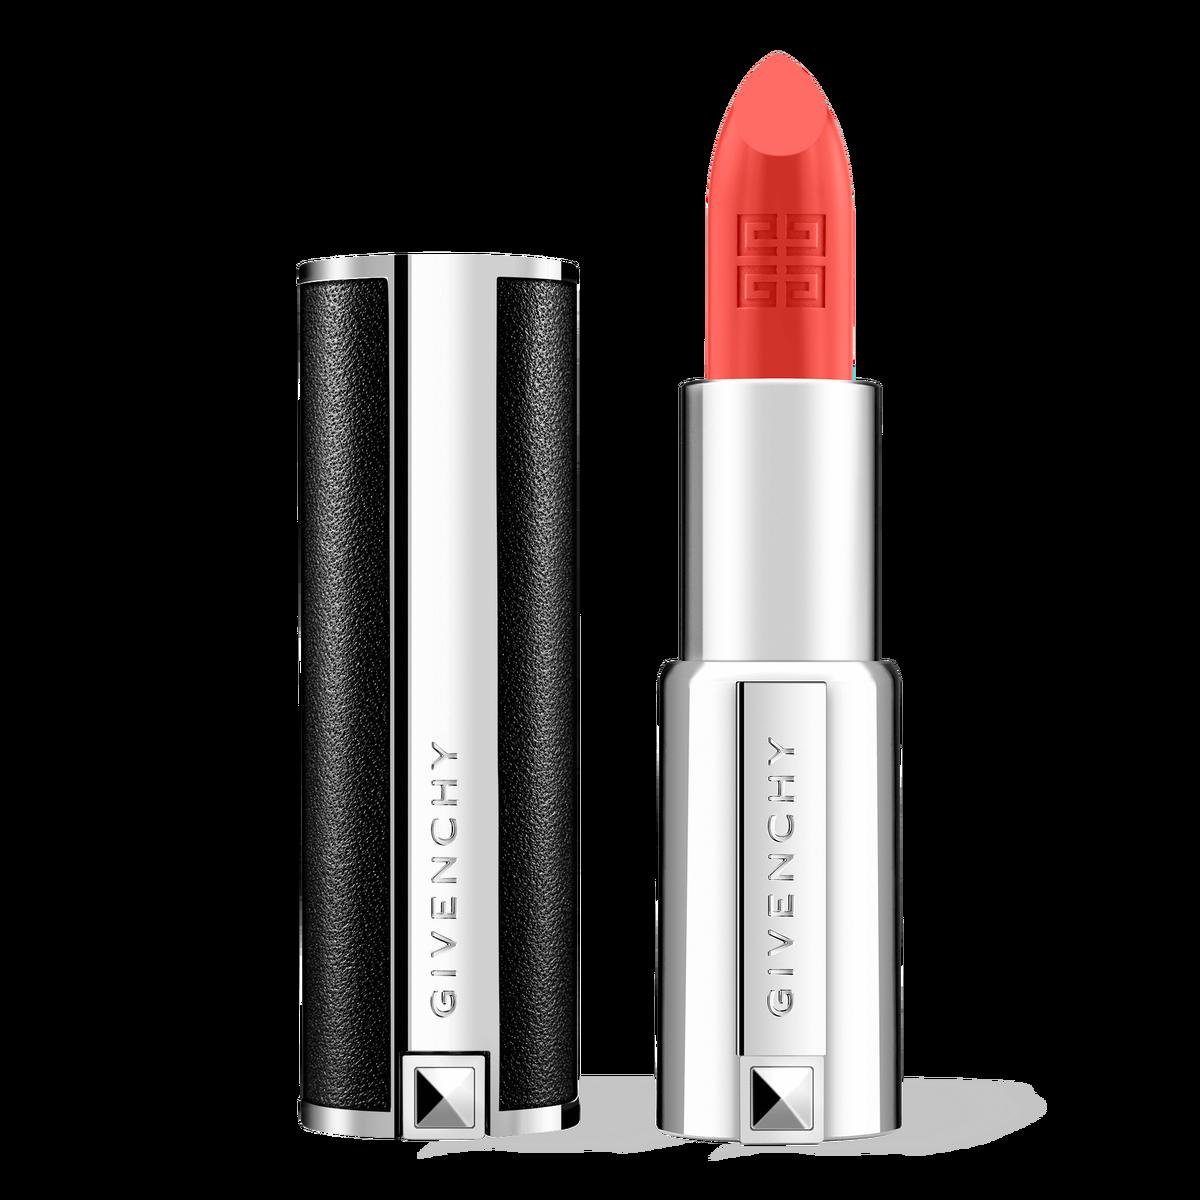 13 La Tulipe Moisturizer Lipstick 3 5gr Daftar Harga Termurah Eye Shadow 128735 Le Rouge Givenchy Brun Crateur P084613